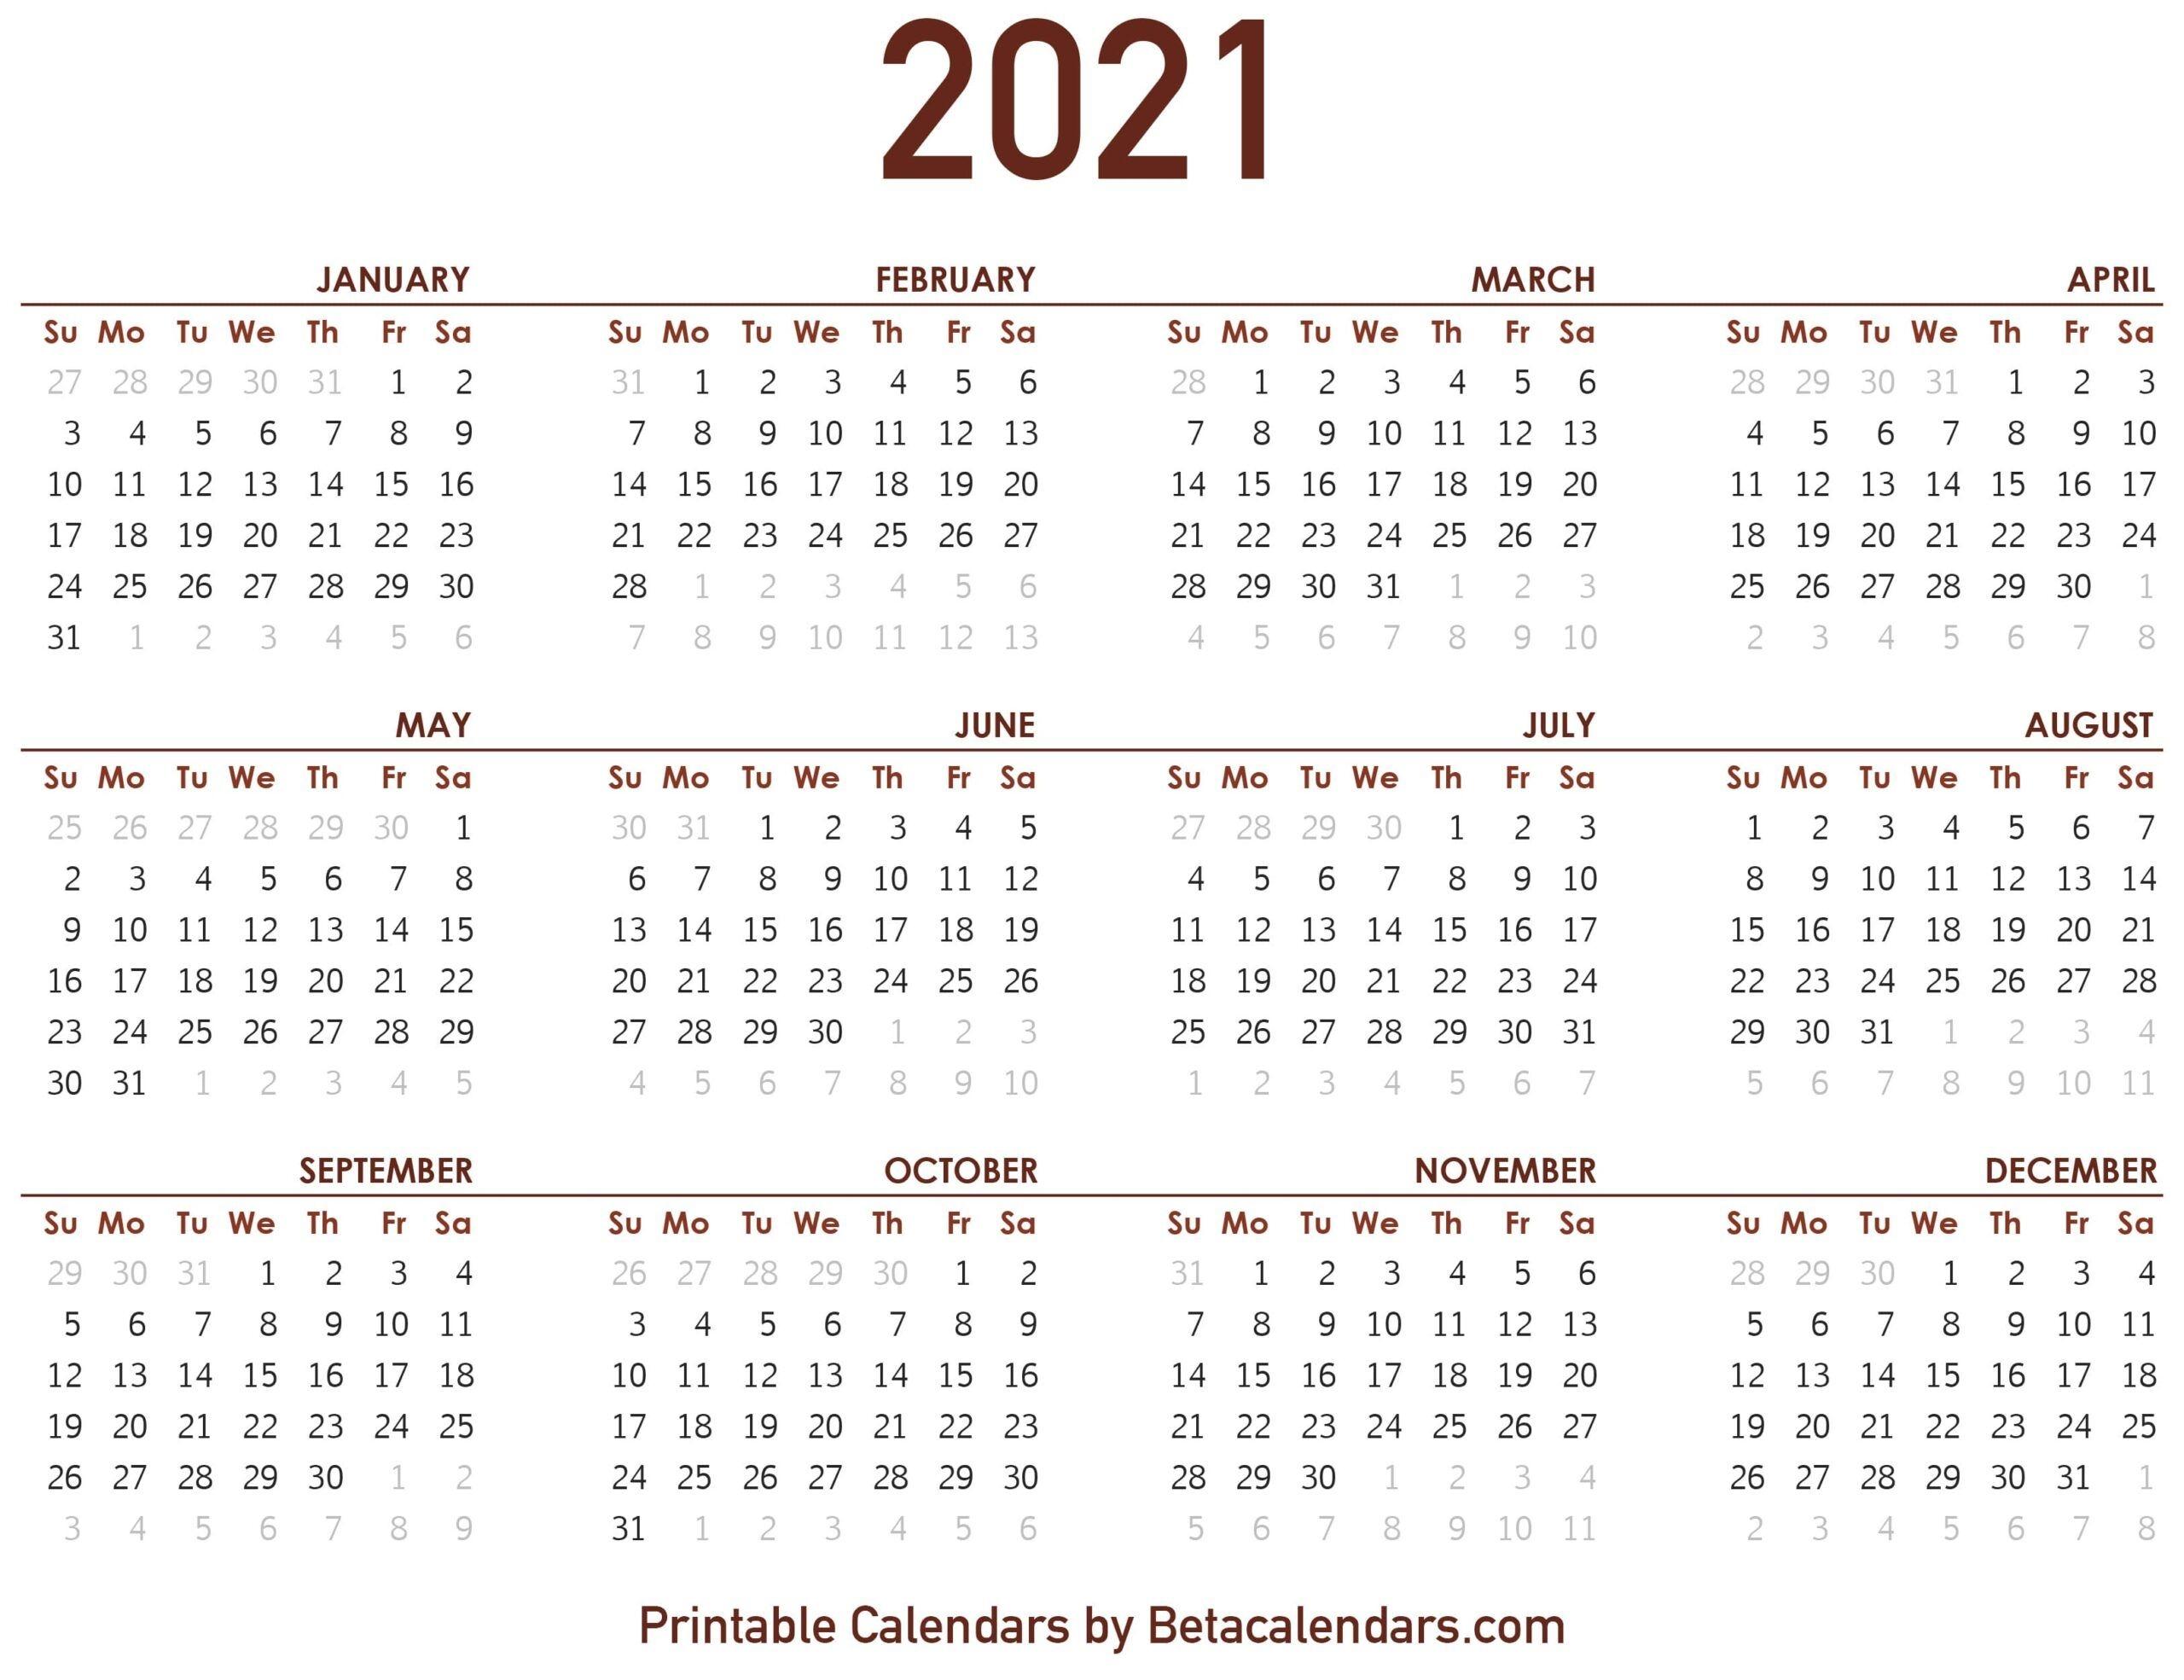 2021 Calendar With Numbered Days - Example Calendar Printable